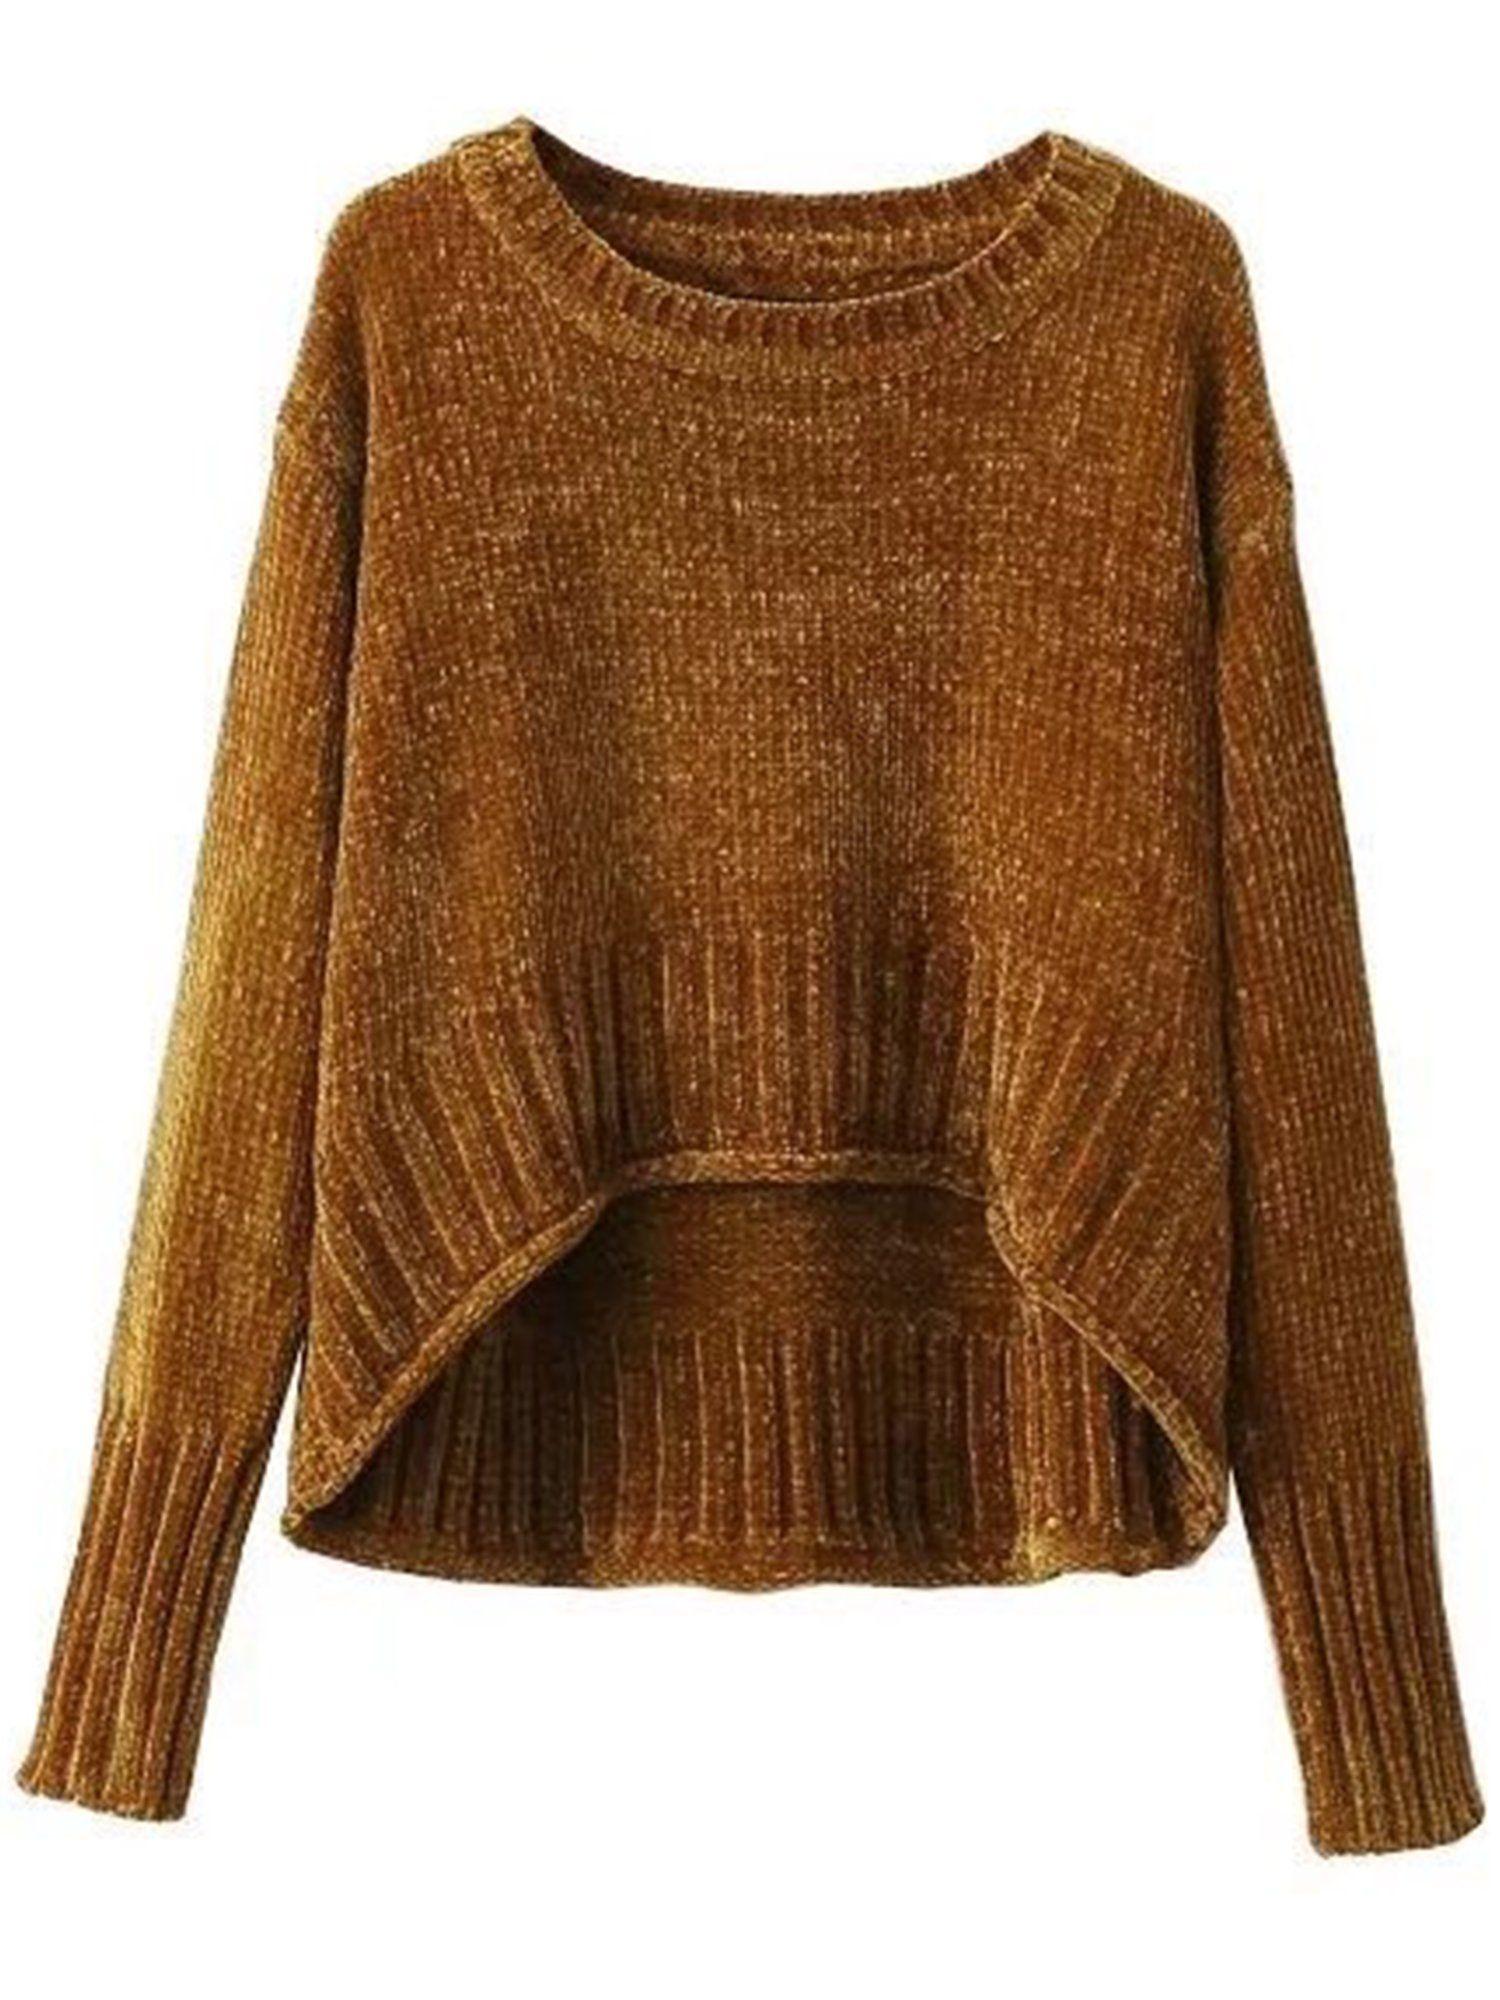 Elisabetta' Velvet Knit Sweater | Extra long sleeve sweater